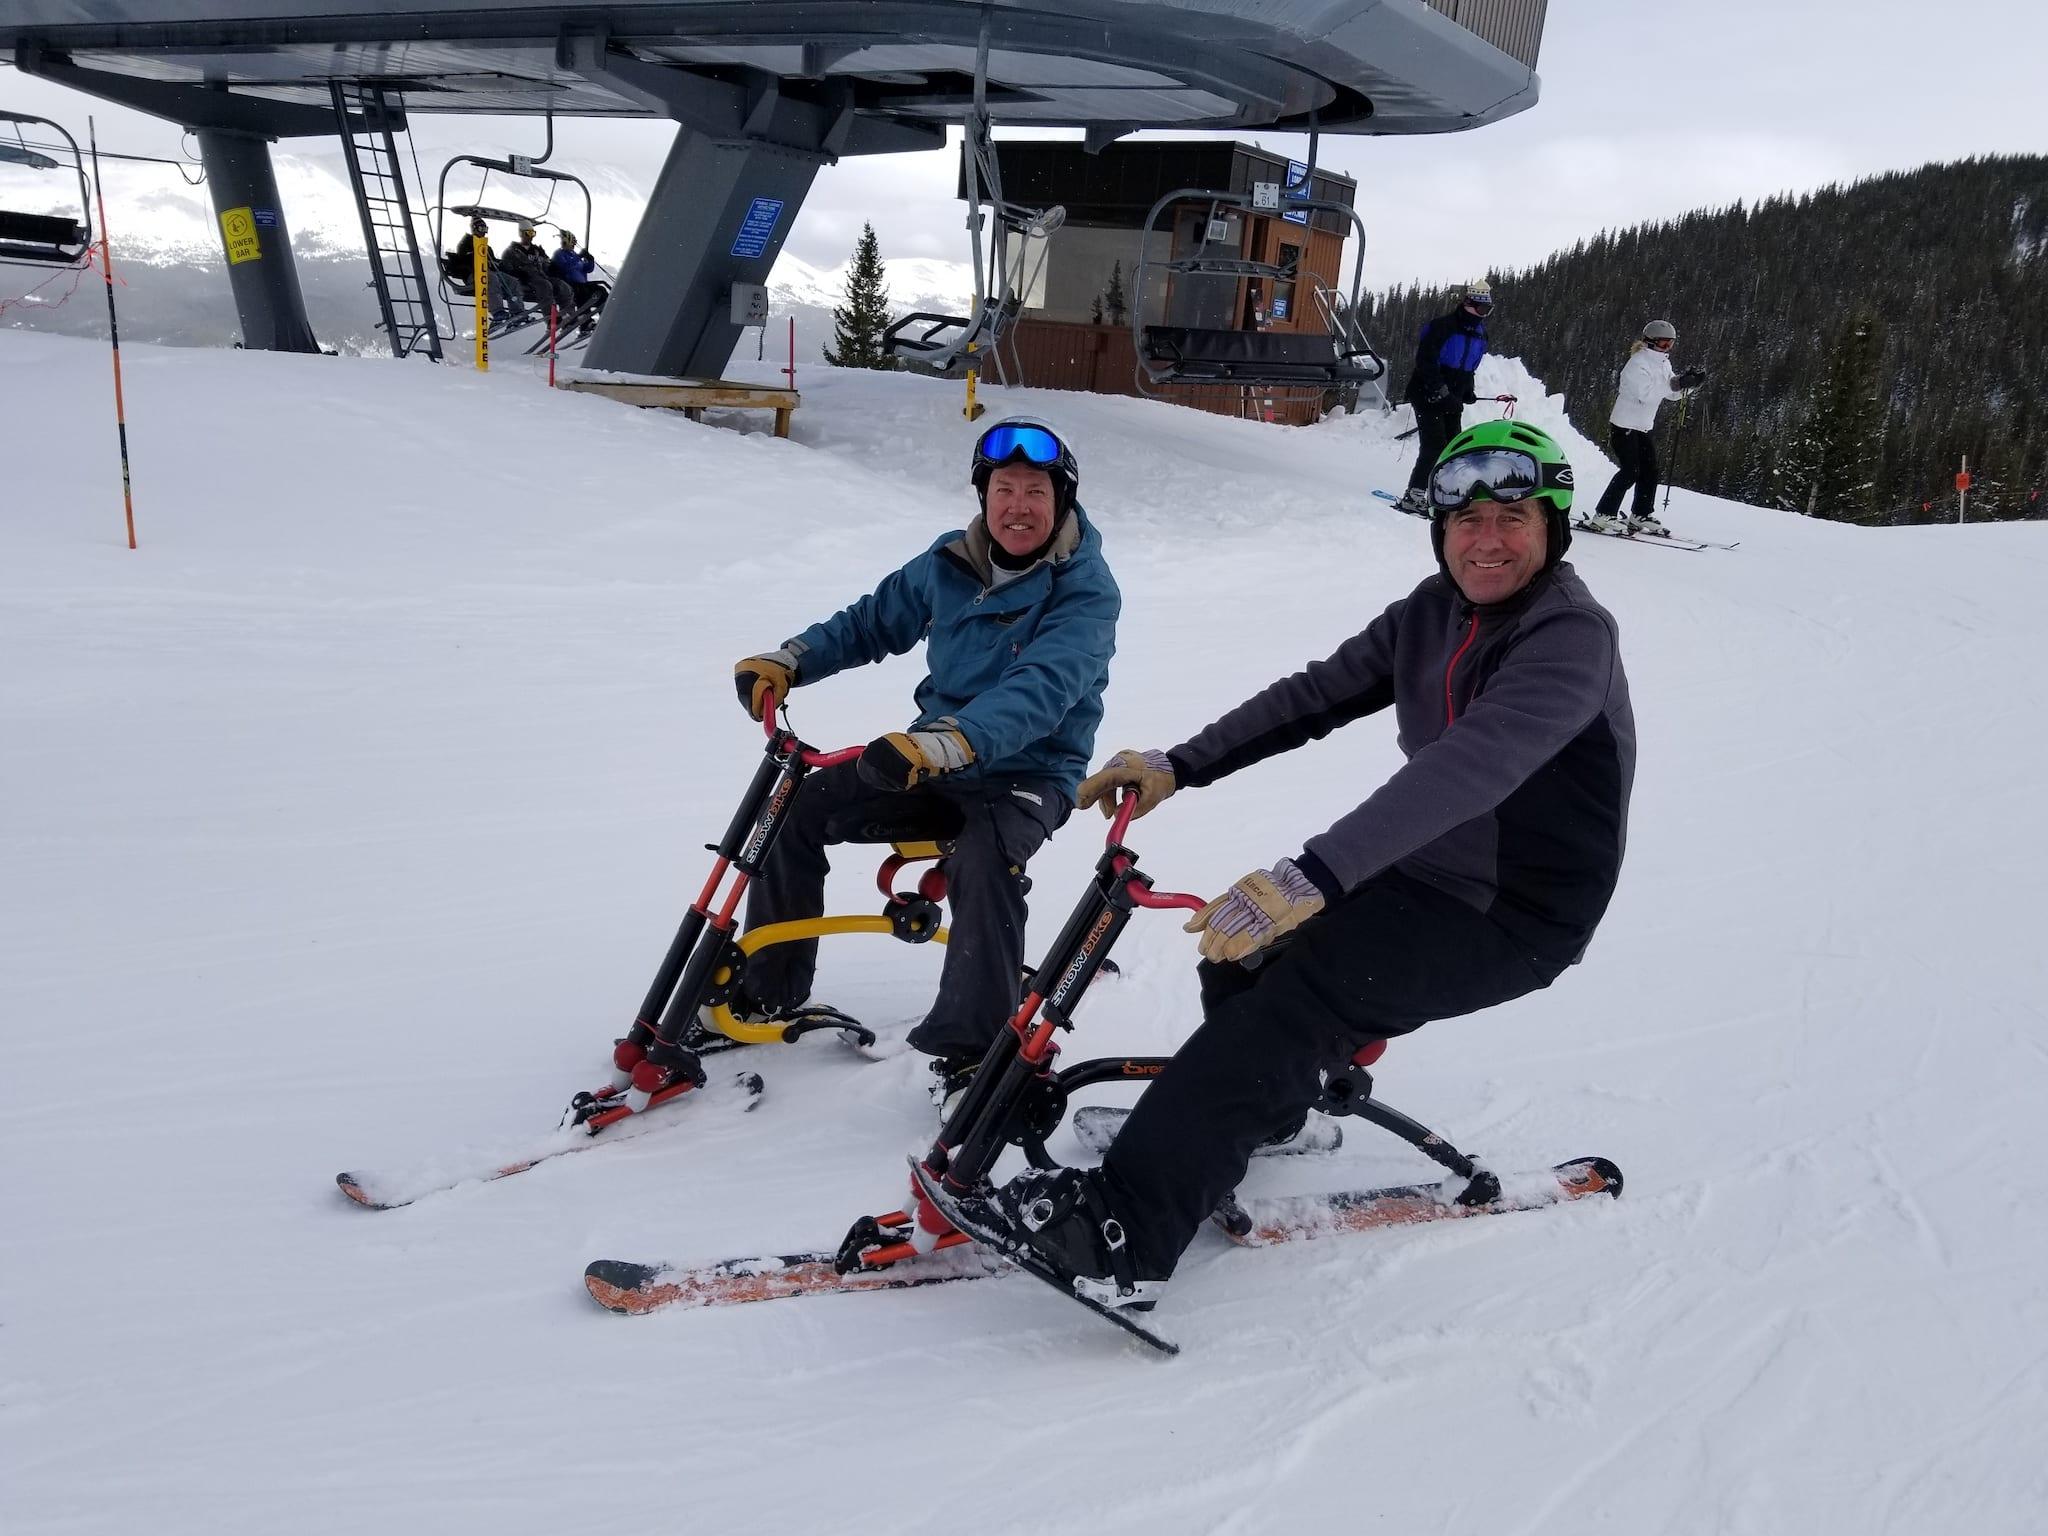 Roger's Snowbike Rentals Breckenridge Ski Resort